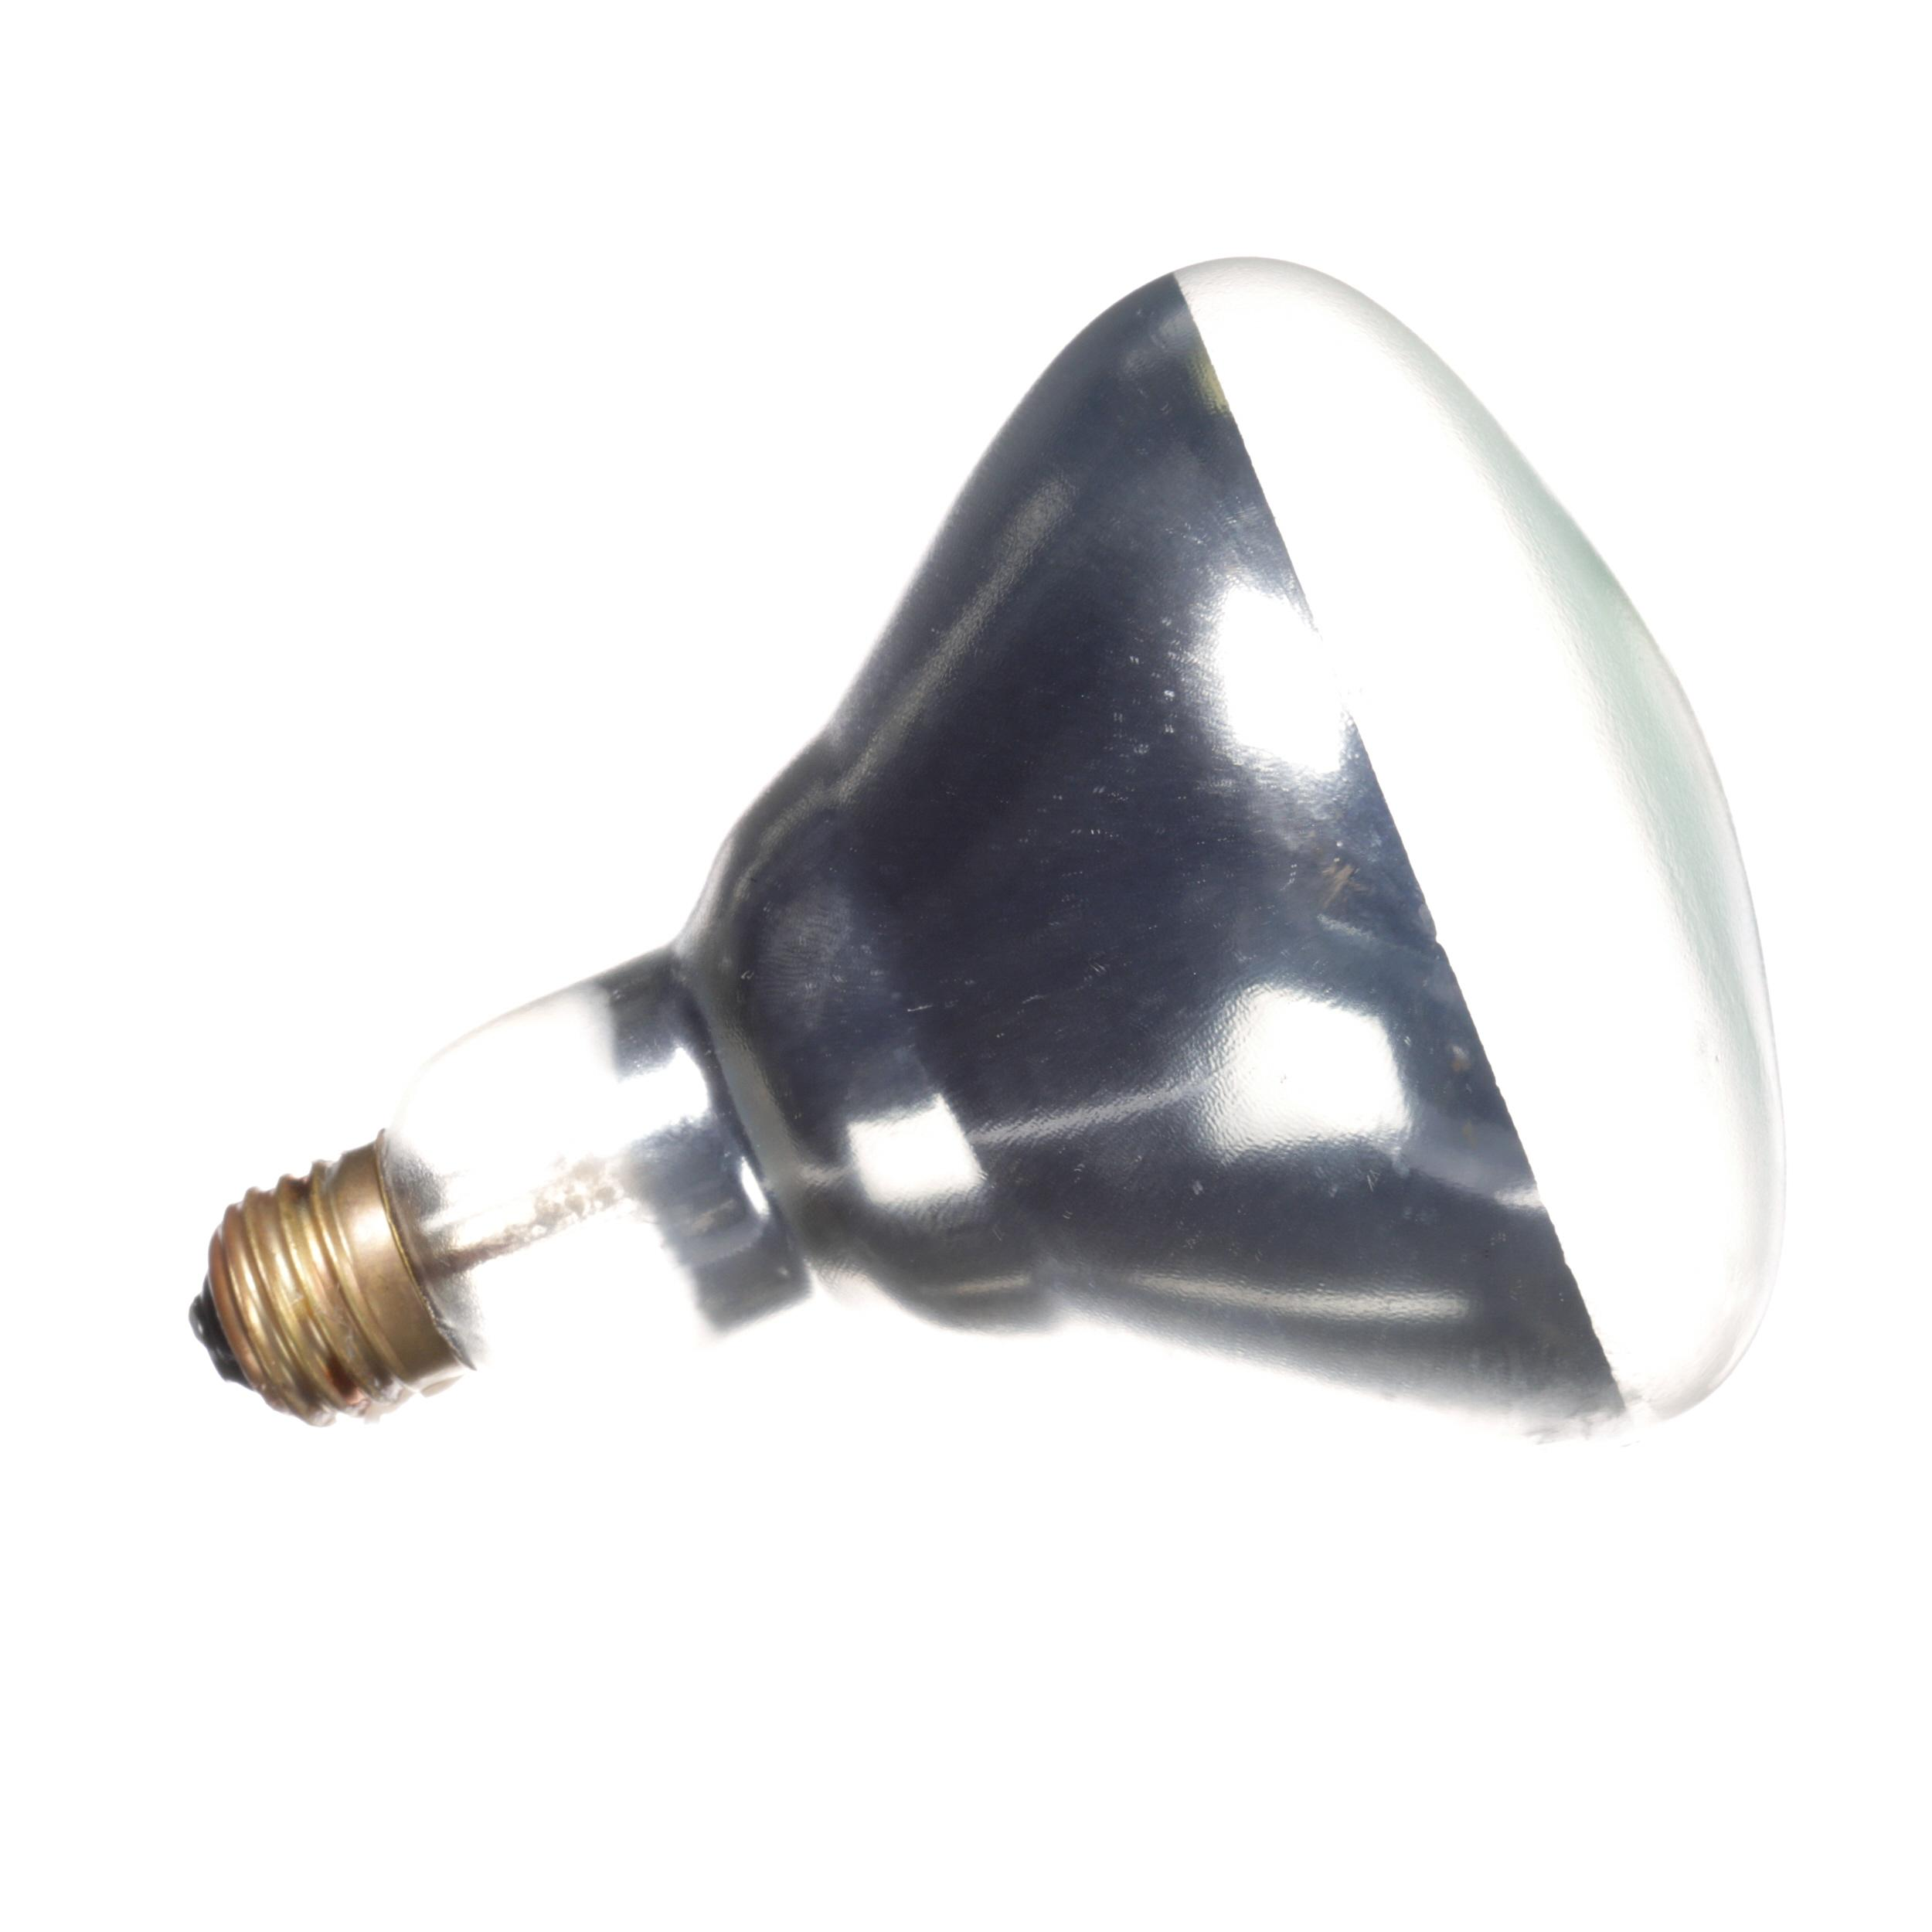 HATCO SAFETY COATED LAMP 250W 240V